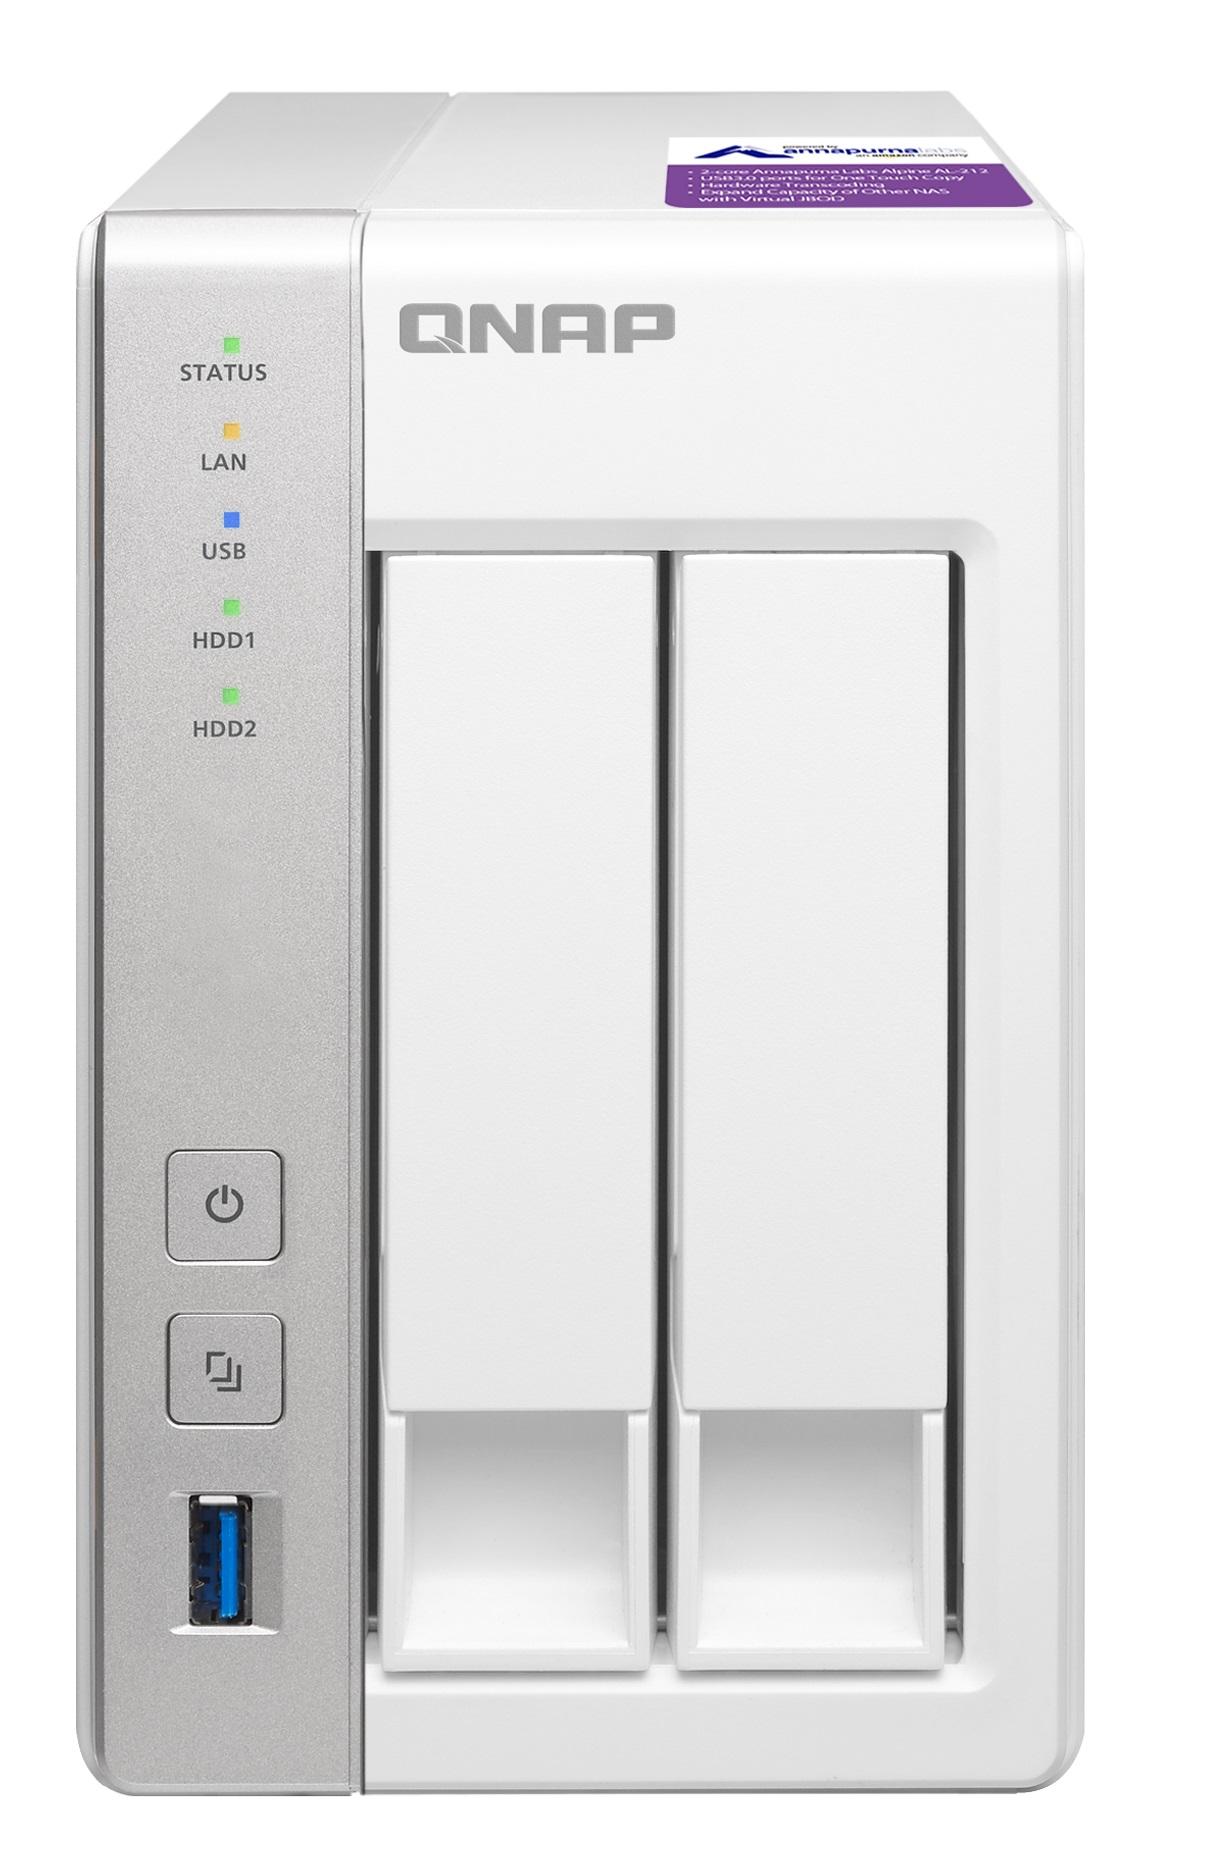 QNAP 2-Bay TurboNAS, SATA 6G, 1,7GHz 2-Core, 1GB RAM, 2x GbE LAN, 3xUSB 3.0